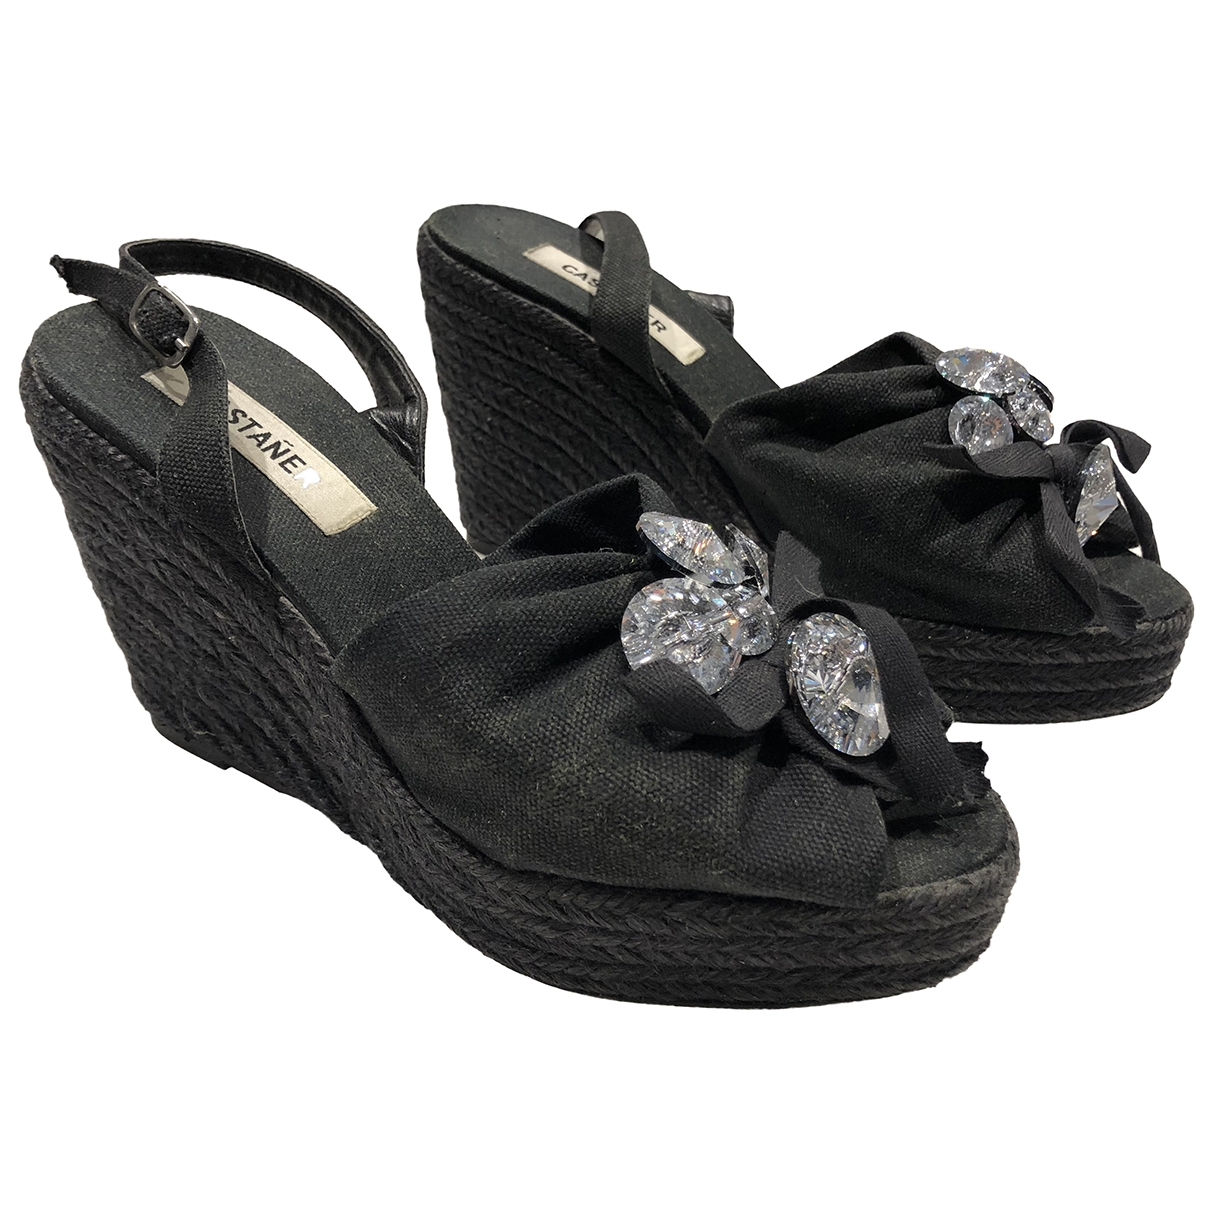 Castaner \N Black Cloth Espadrilles for Women 38 EU